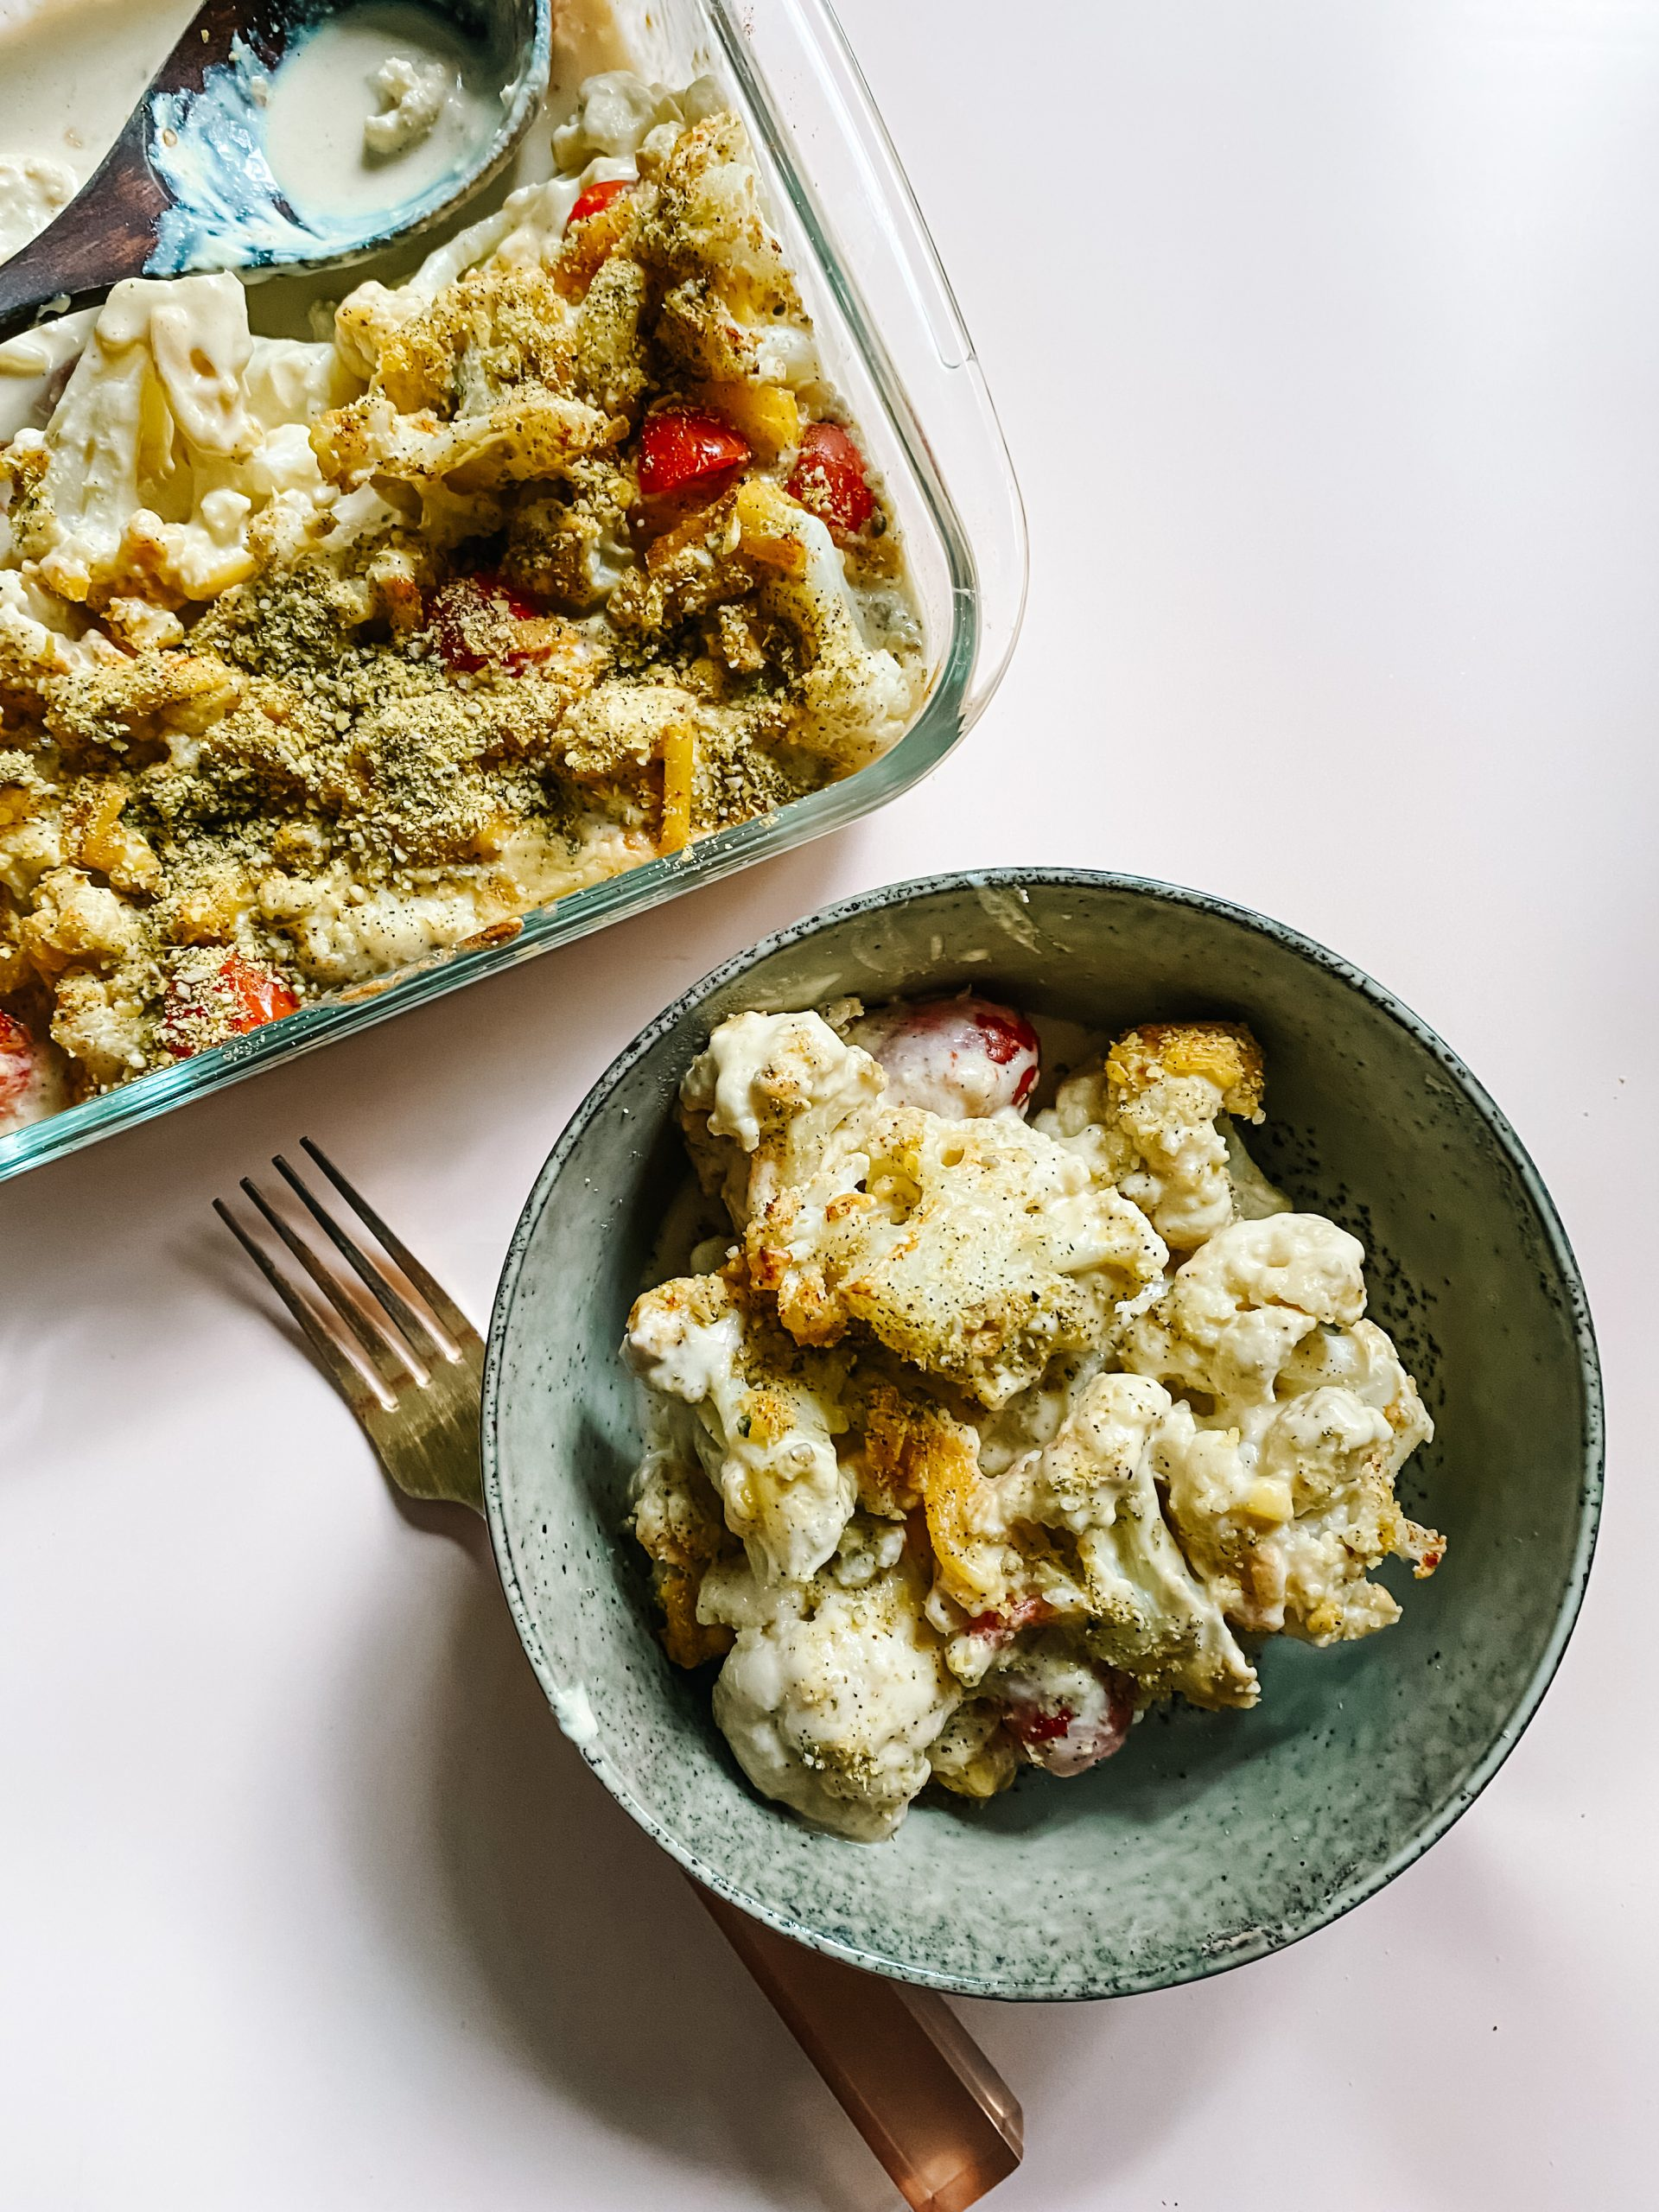 Creamy Vegan Cauliflower Bake